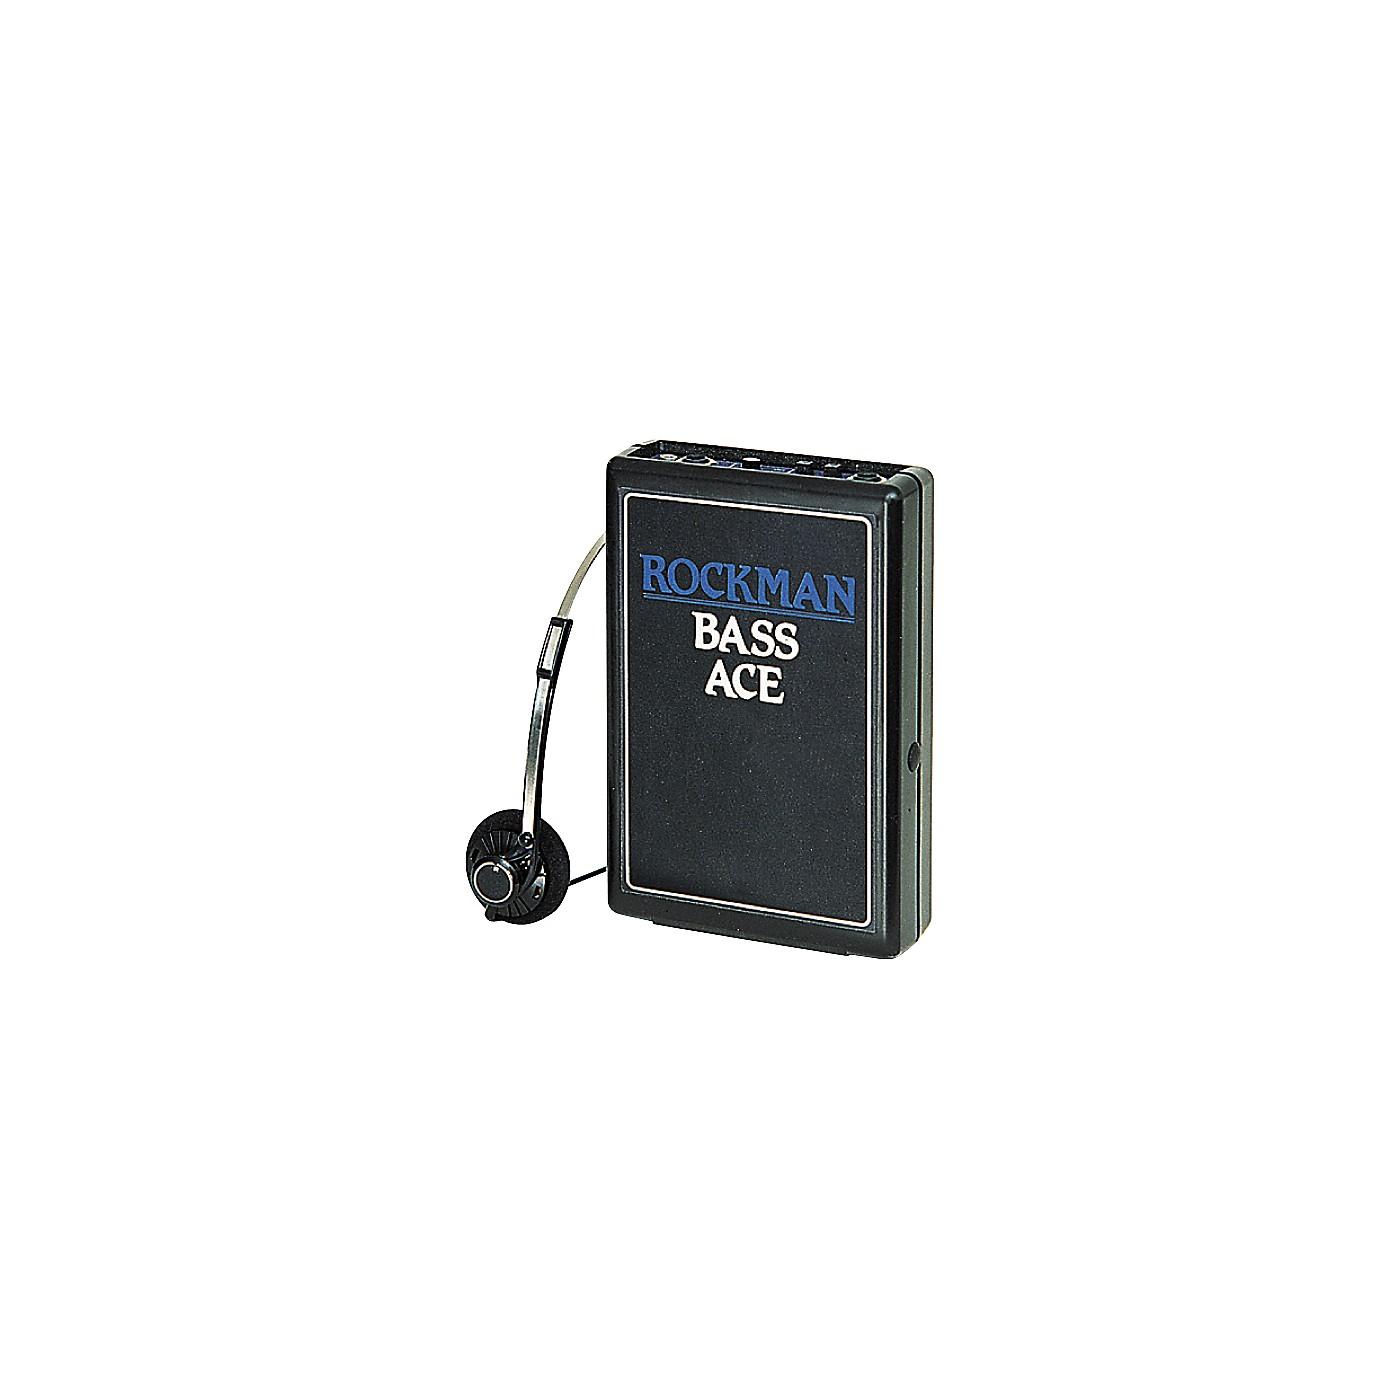 Rockman Bass Ace Headphone Amp thumbnail